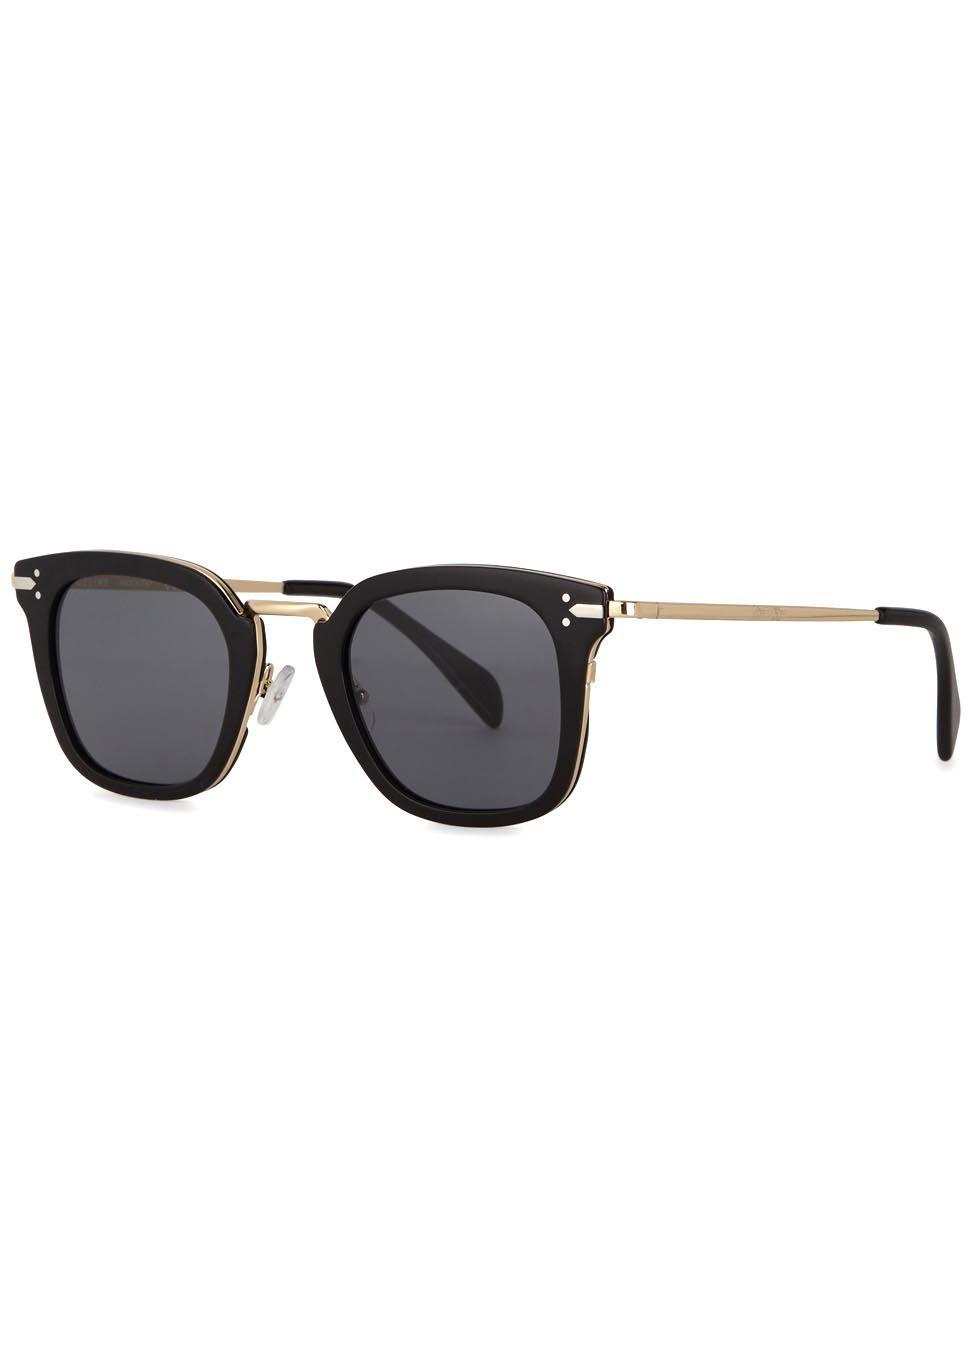 8b877e8bed Céline black acetate sunglasses Grey lenses